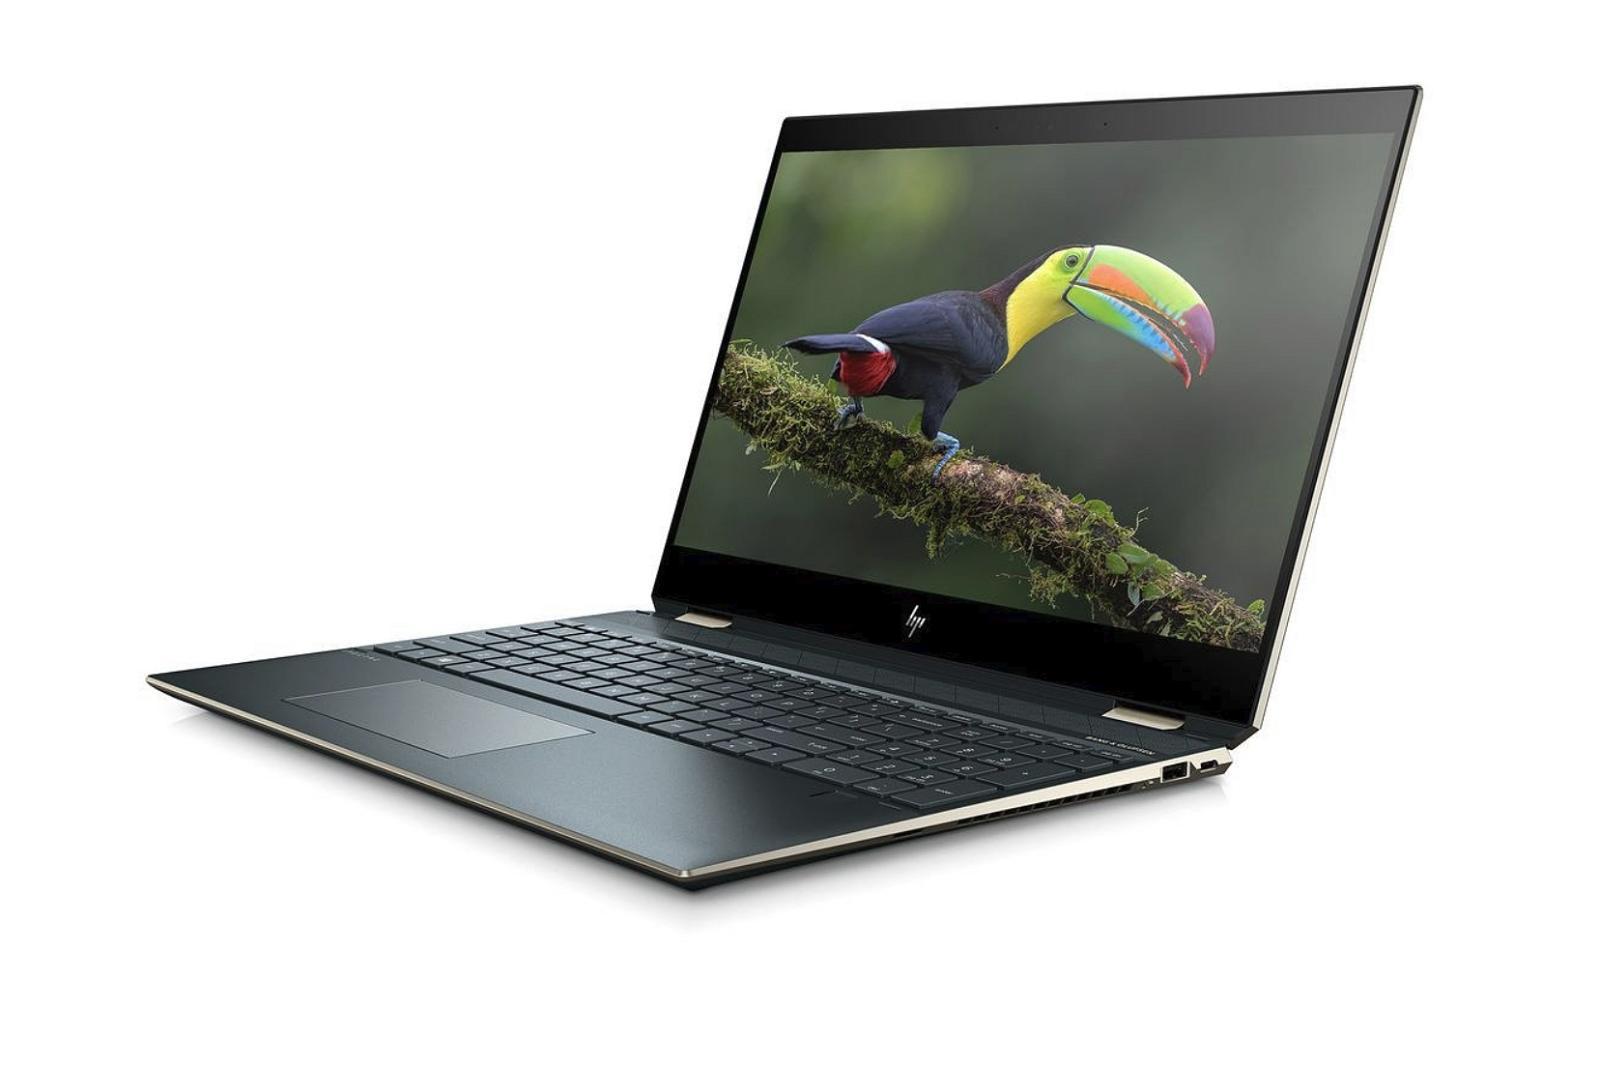 HP Spectre x360 OLED laptop